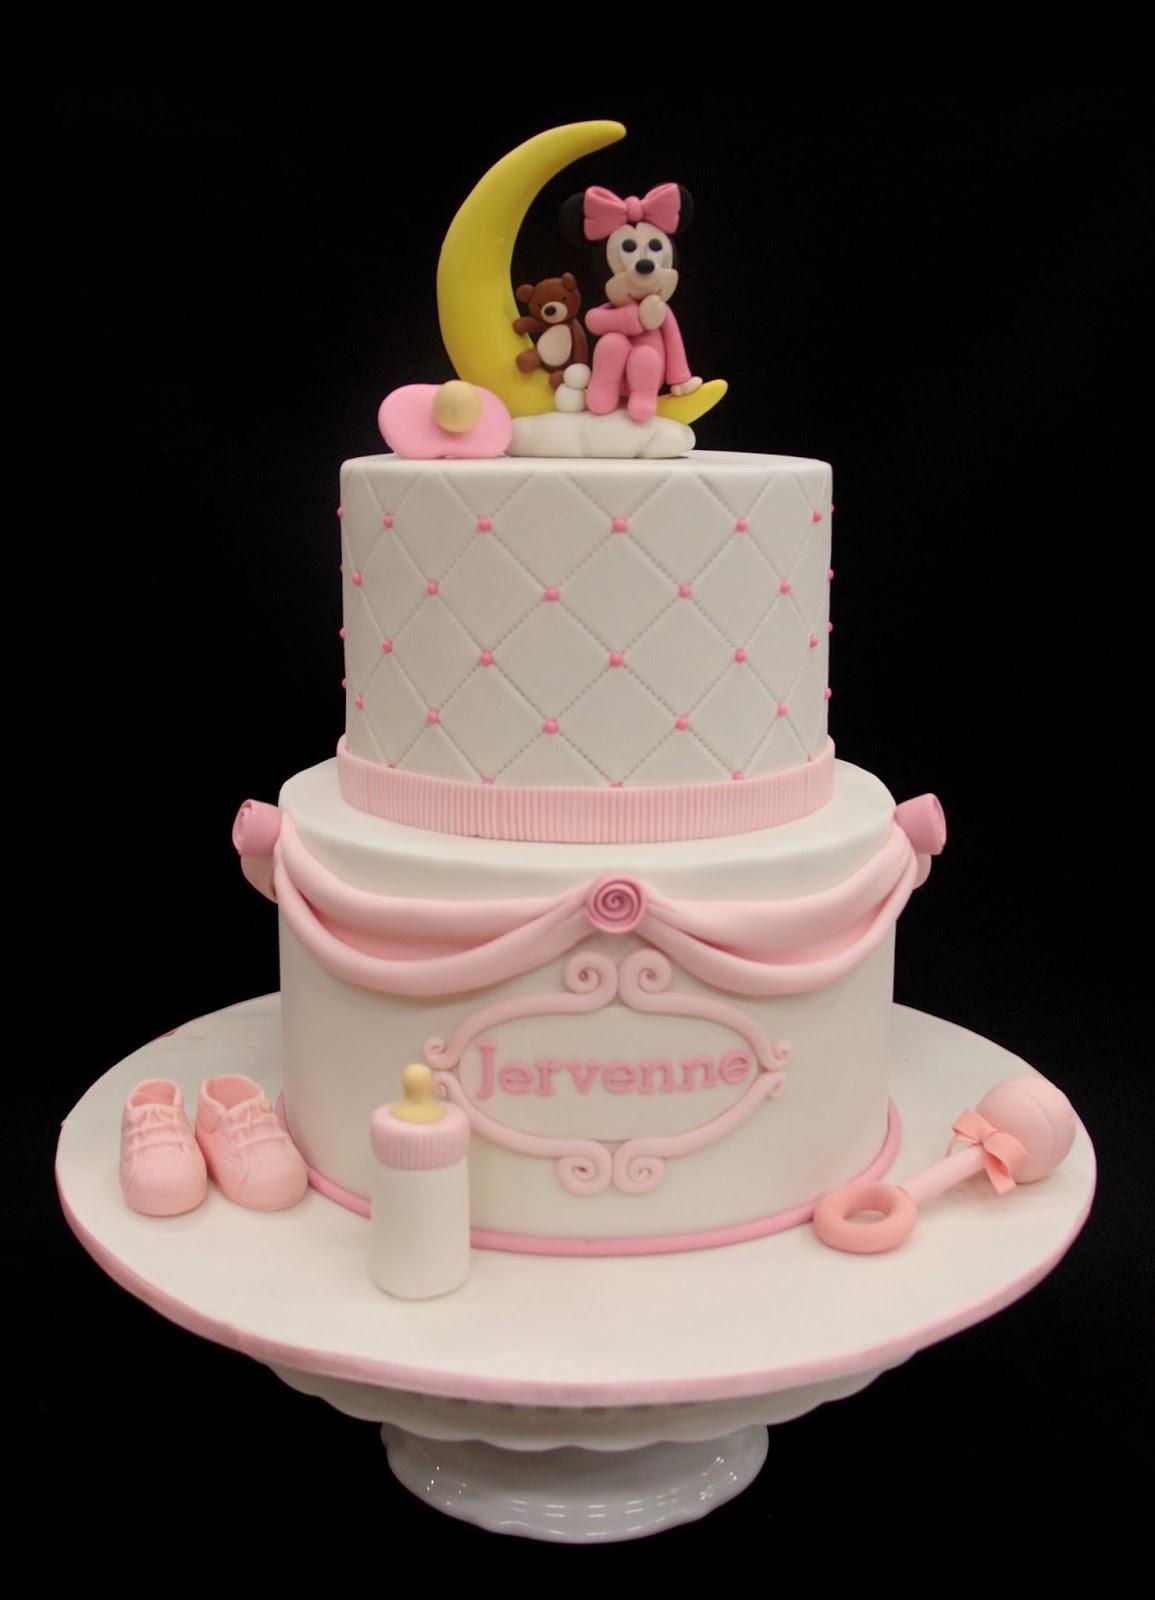 Penang Wedding Cakes By Leesin Baby Minnie Baby Cake